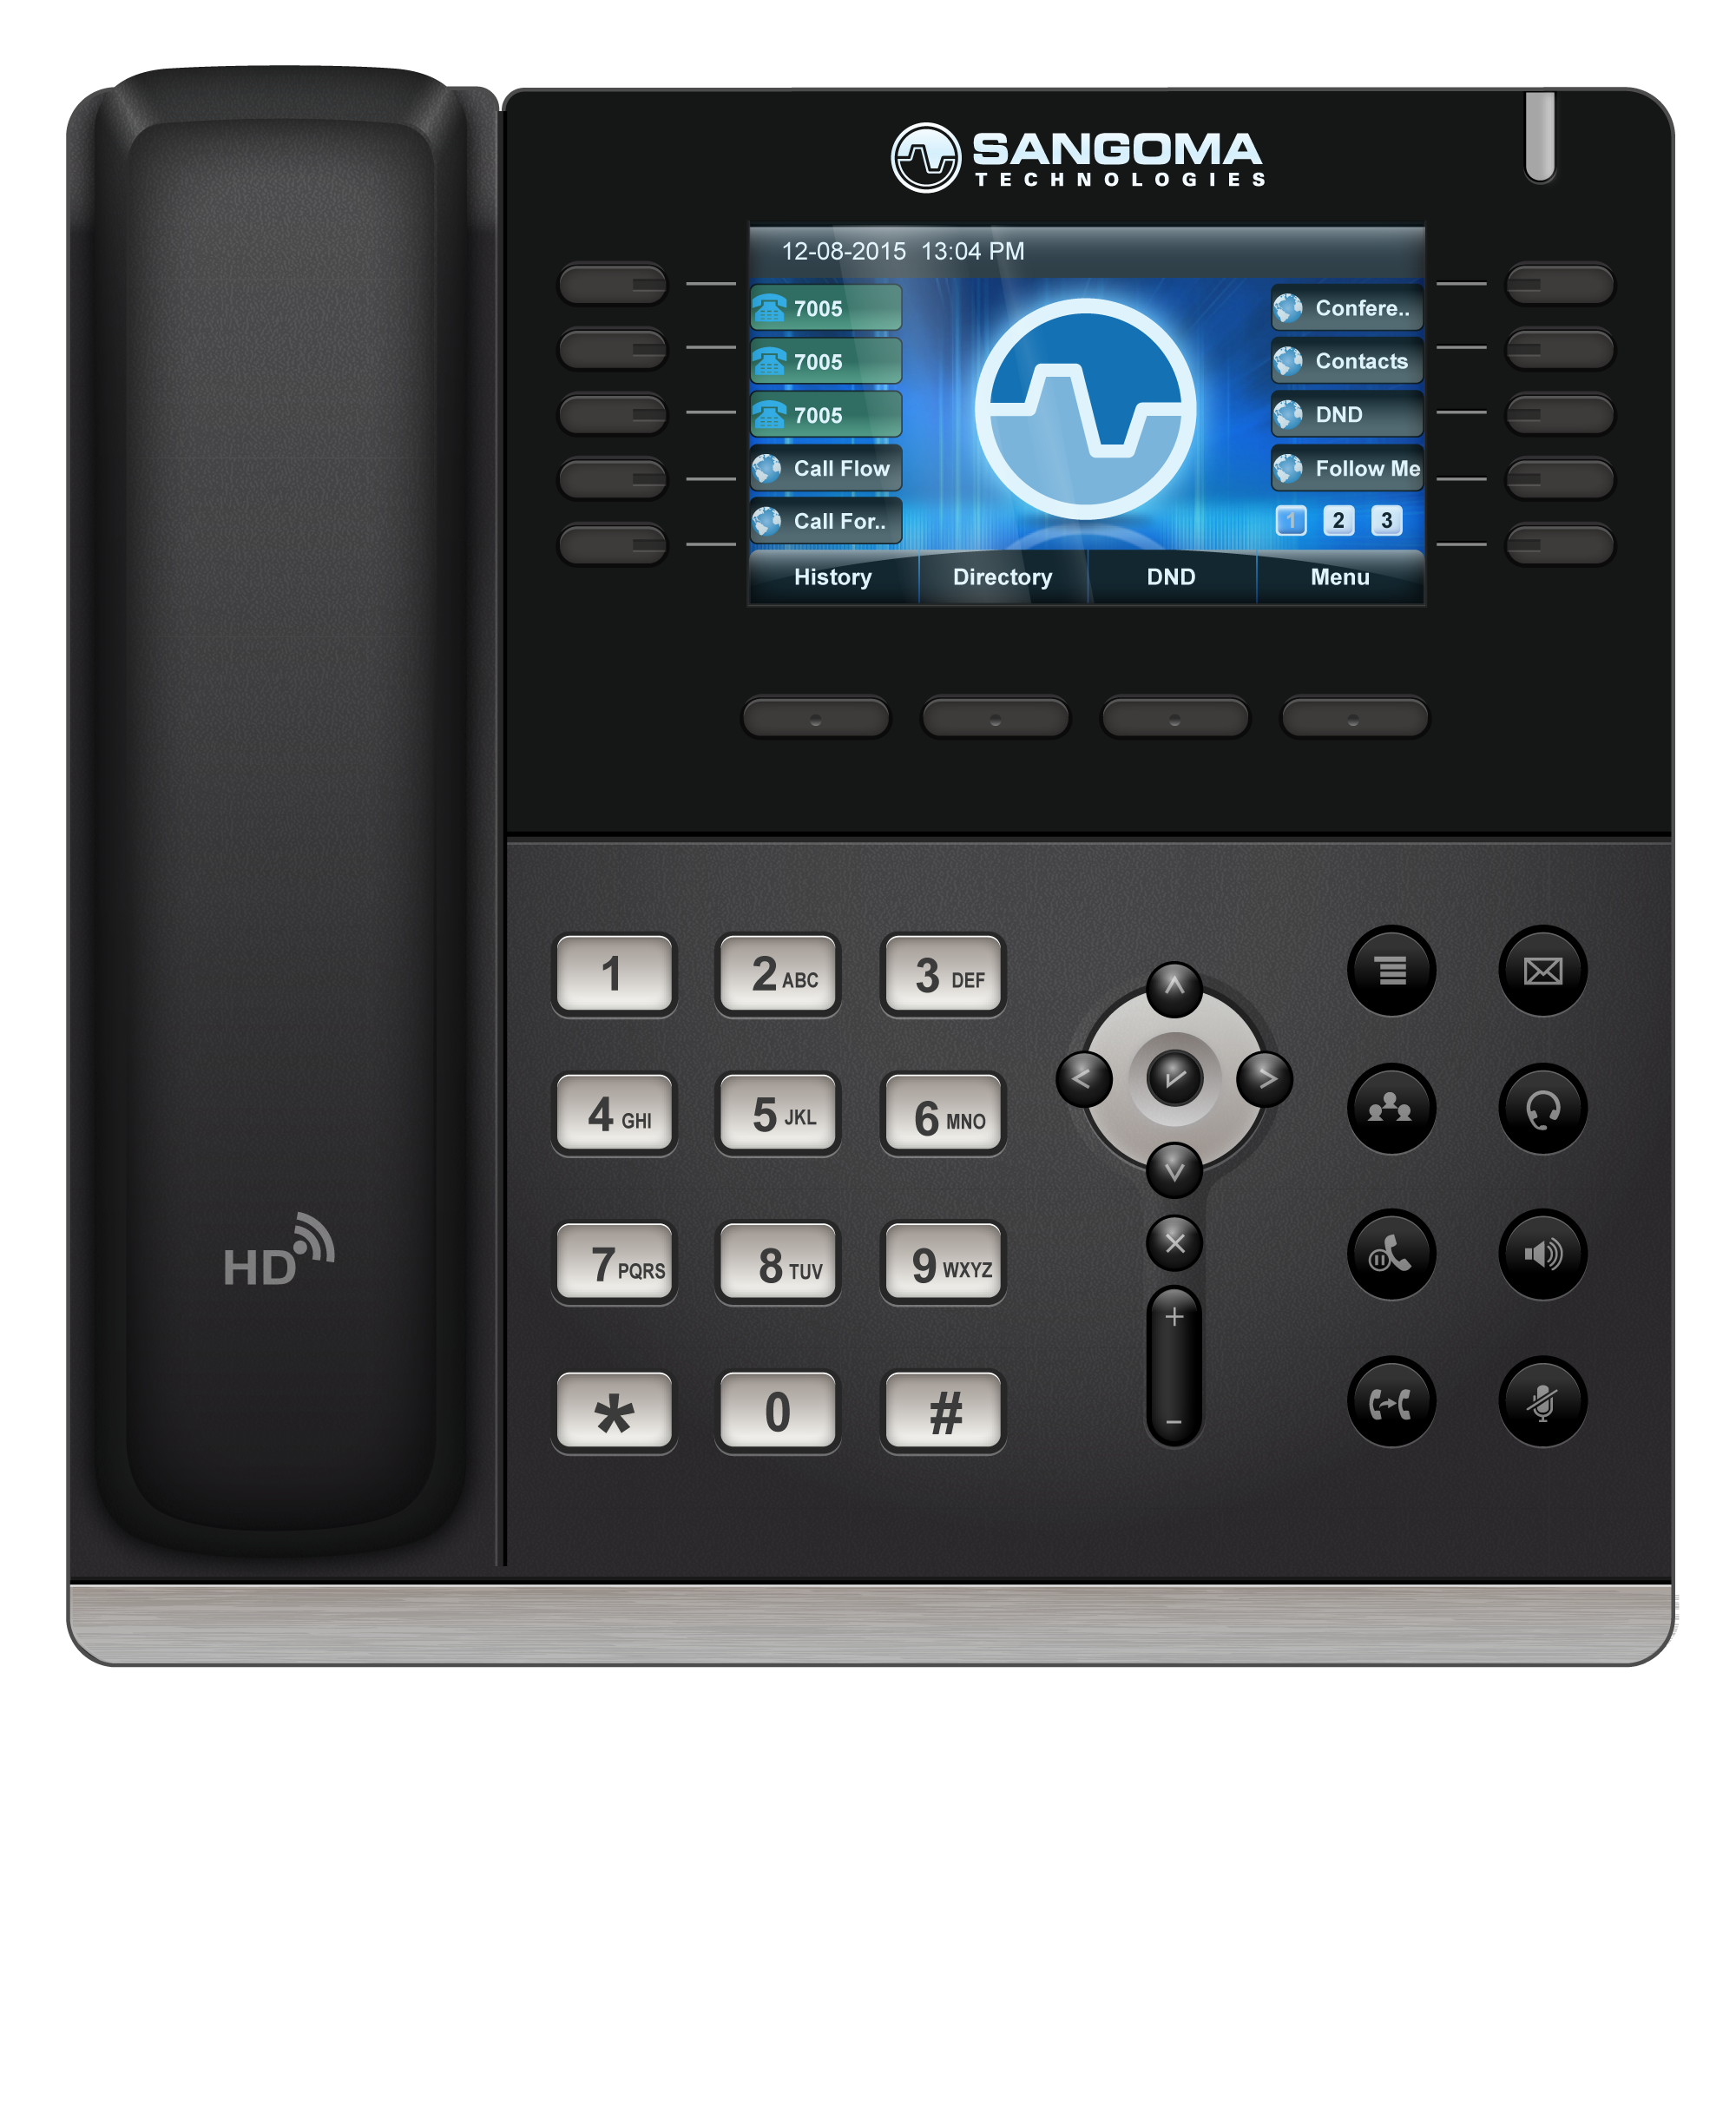 Soluciones PBX Conmutador Cloud PBX Virtual VoIP